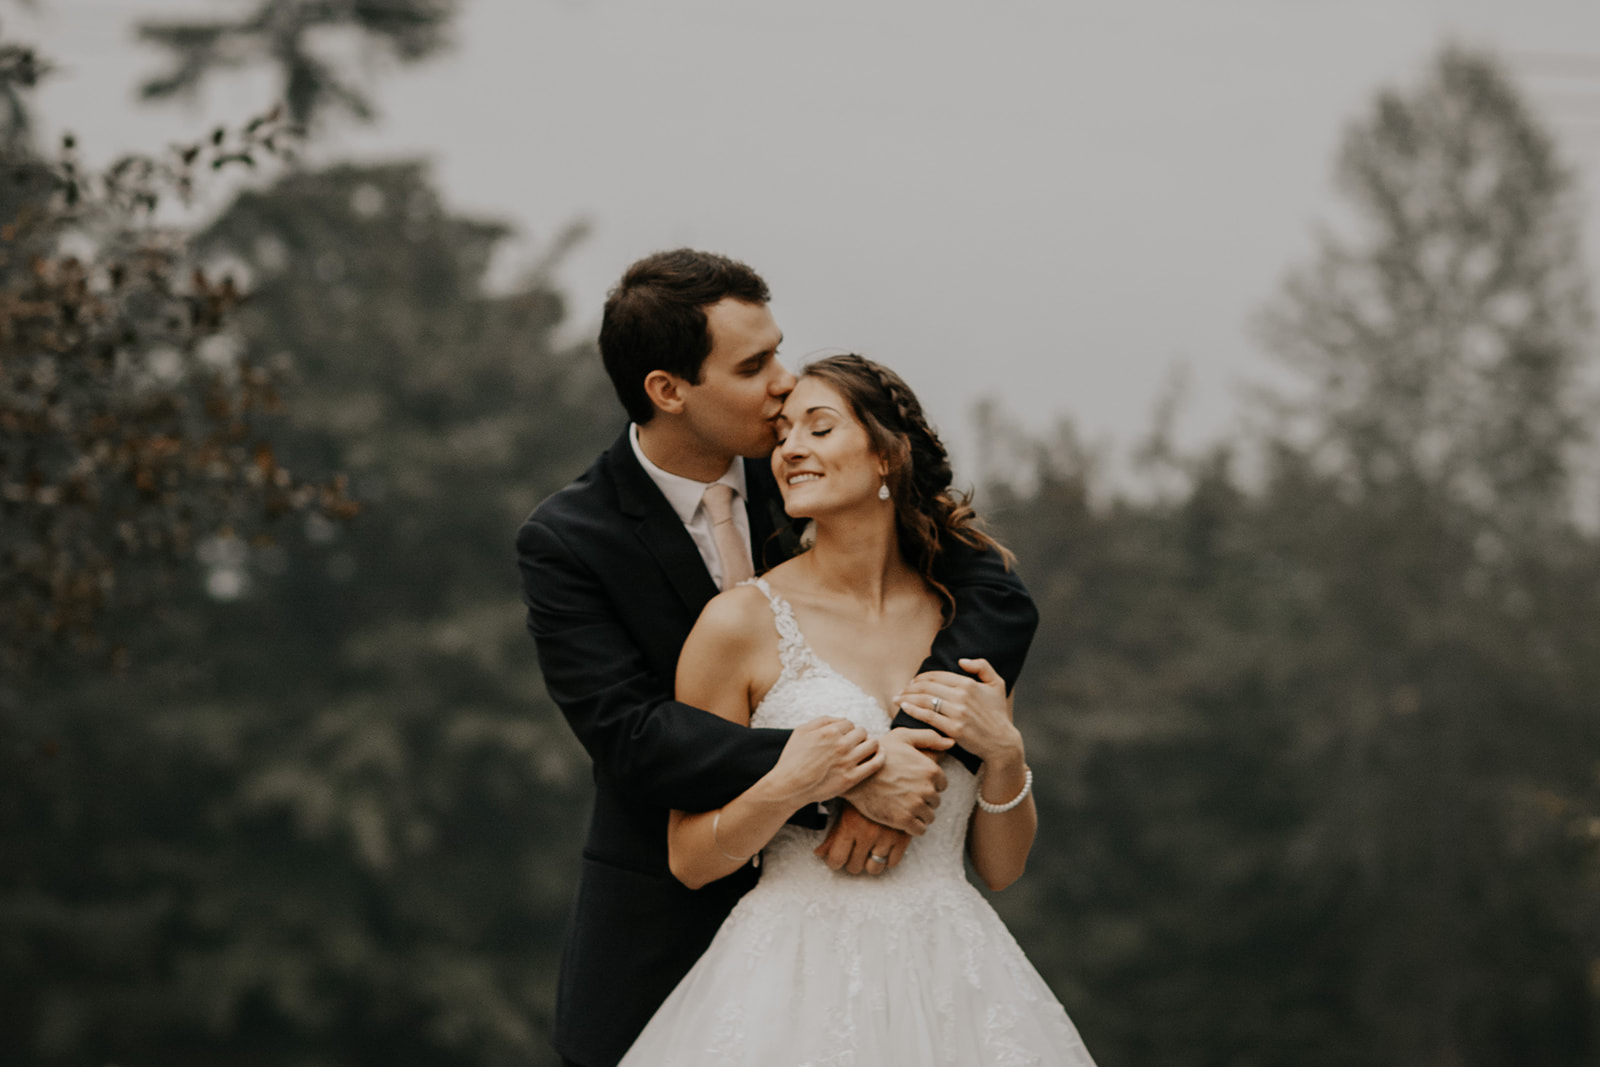 ginapaulson_camiryan_wedding-1109.jpg